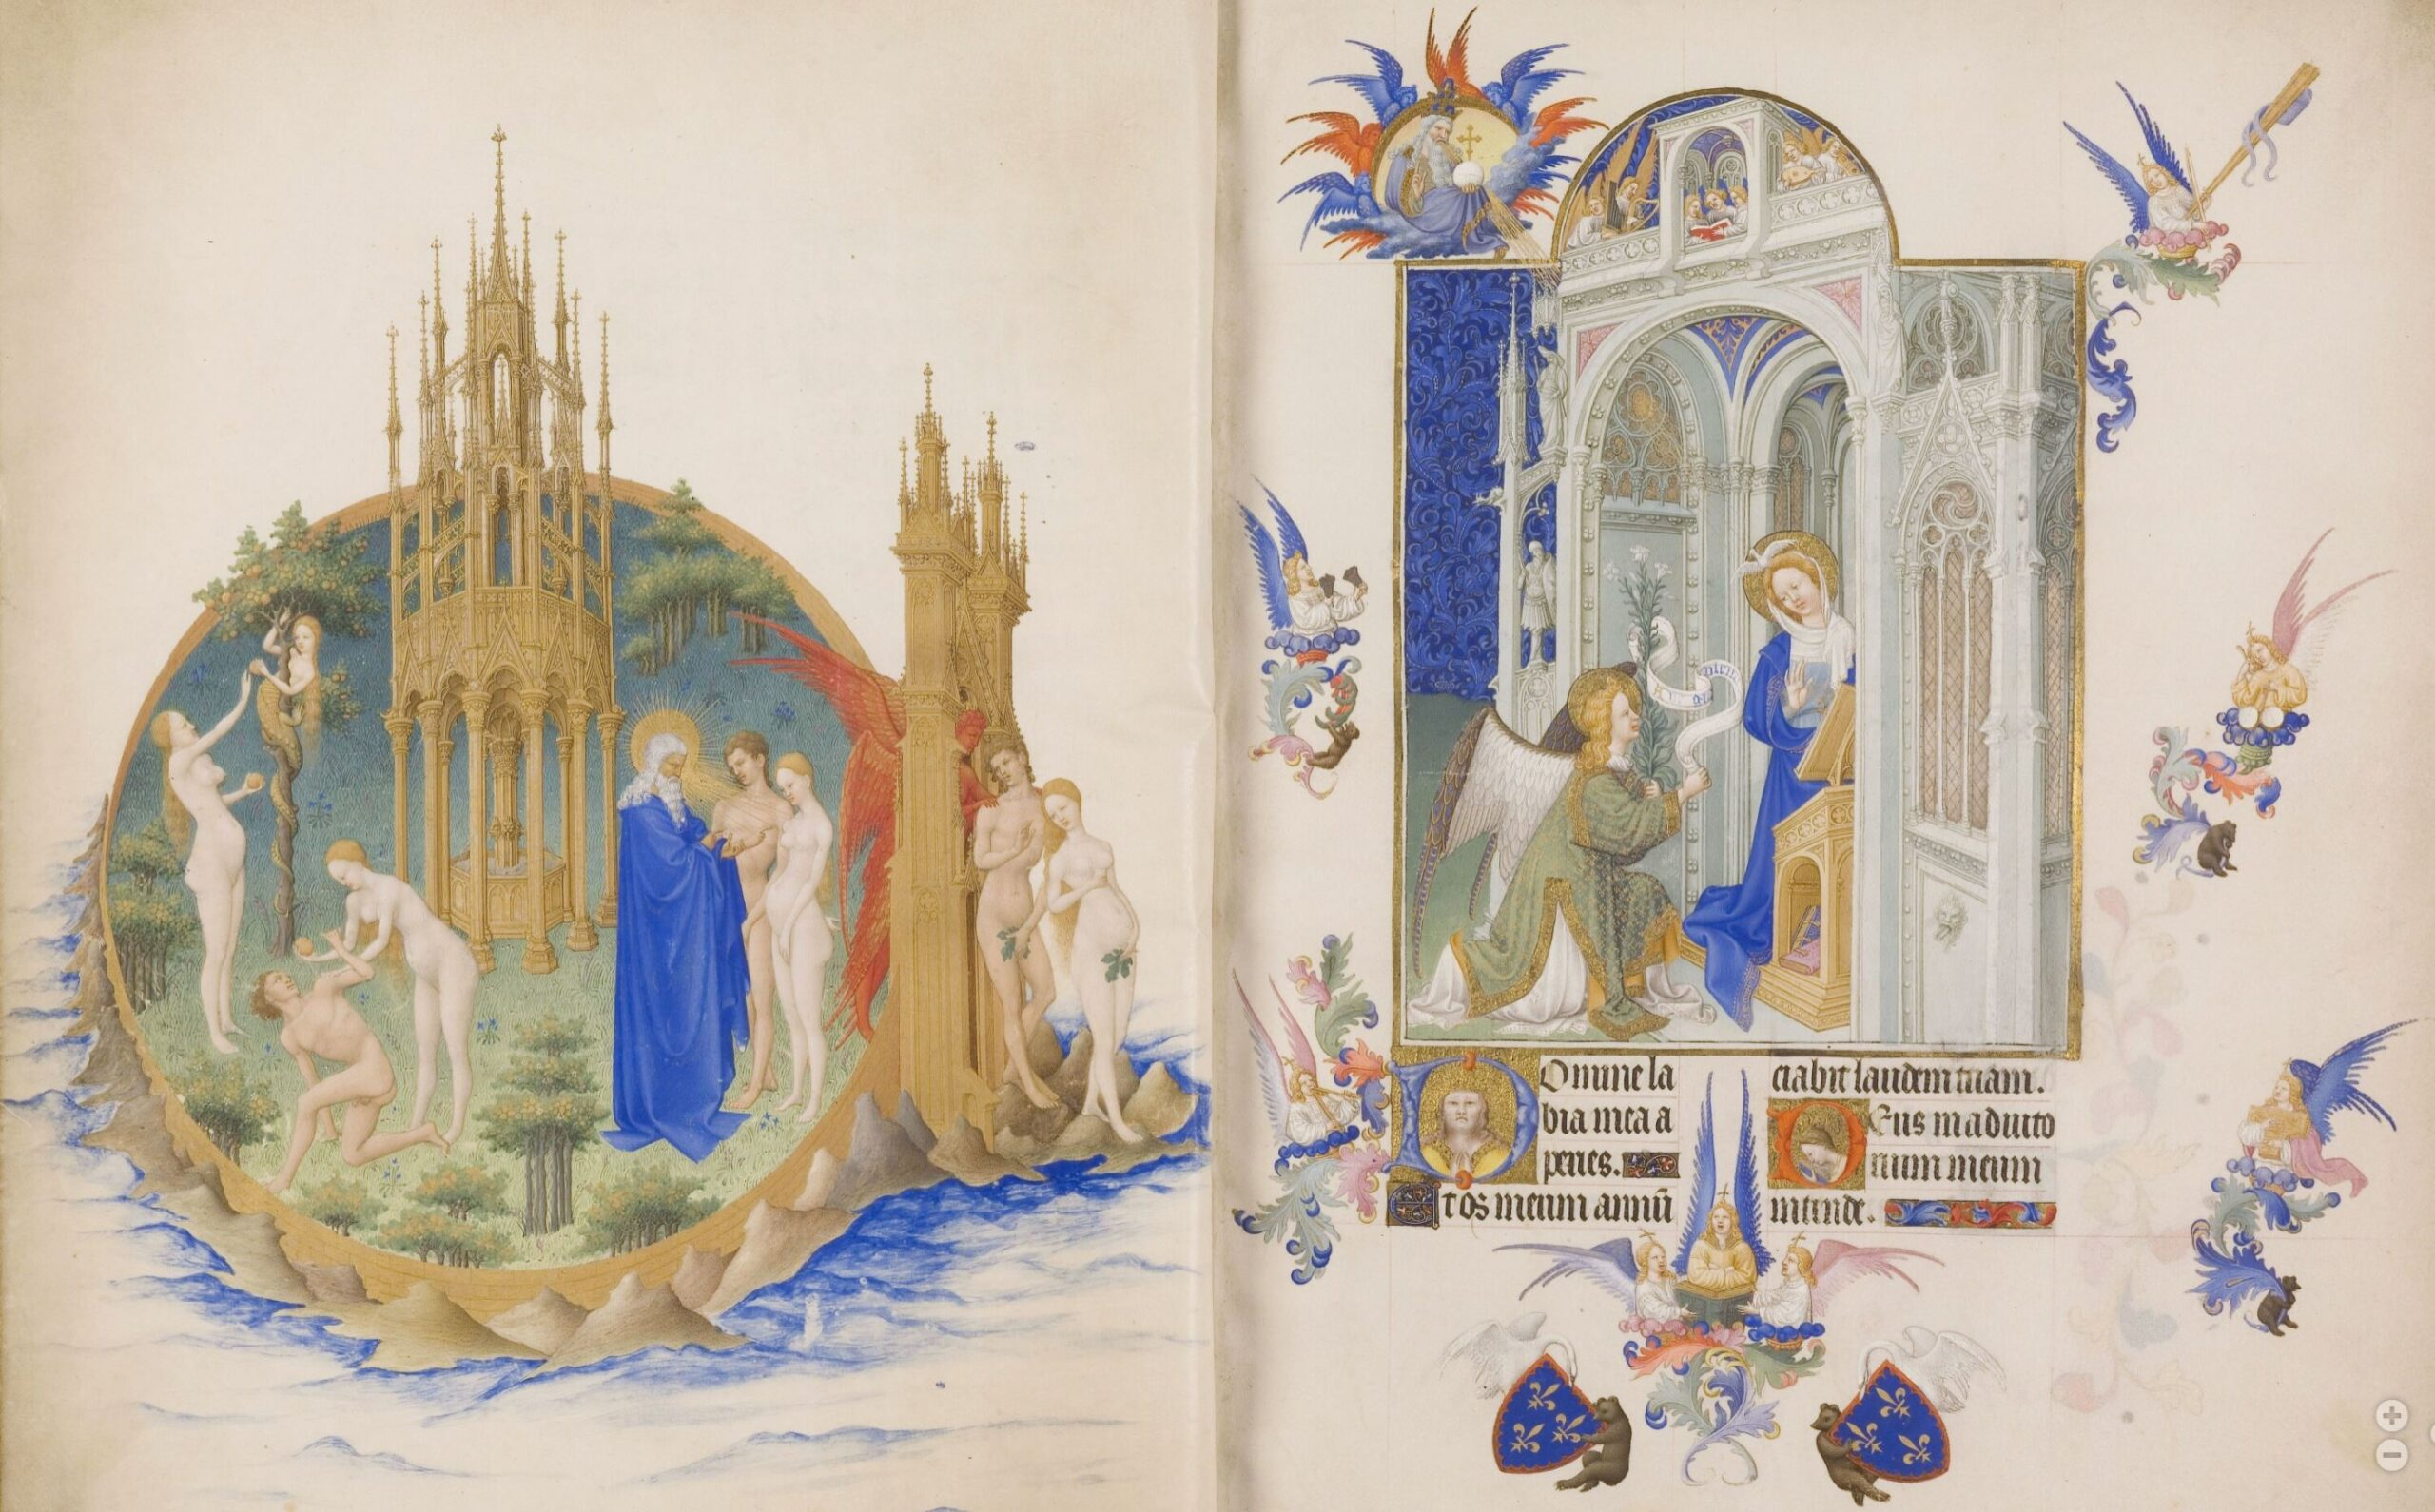 Les_Tres_Riches_Heures_du_duc_de_Berry Musee Conde Chantilly MS 65 fol 25v-26 Limbourg 1411-16